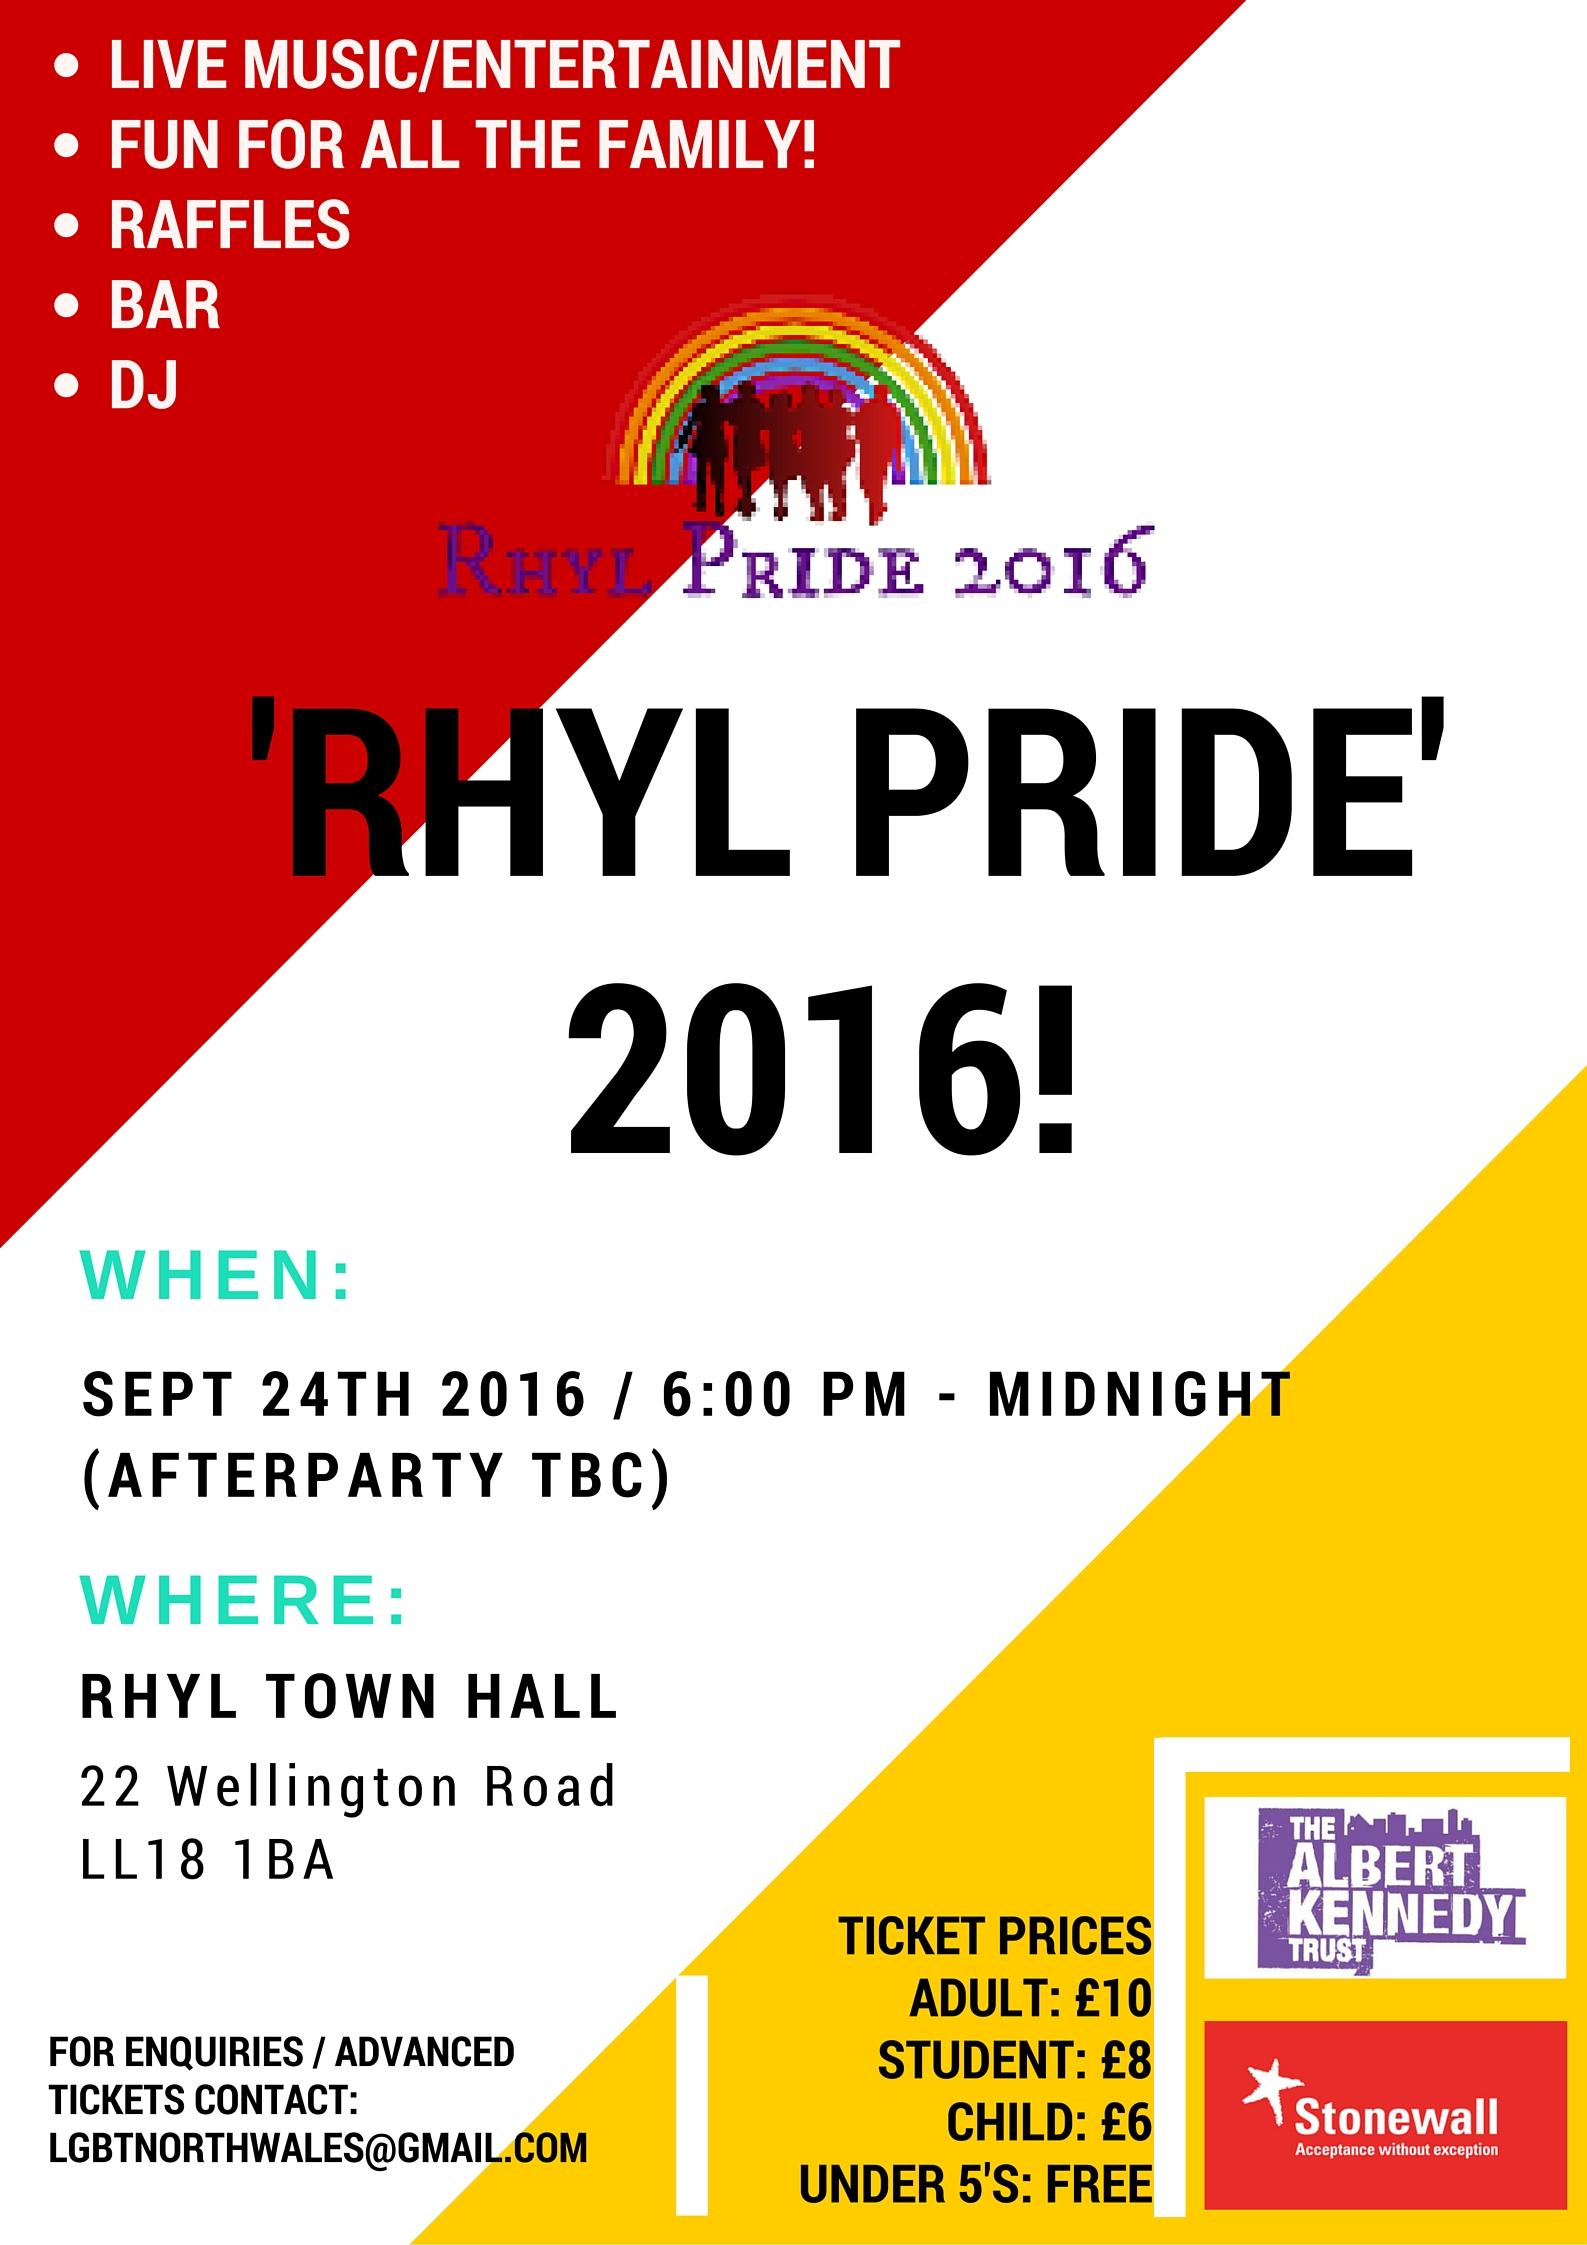 Rhyl pride 2016 poster